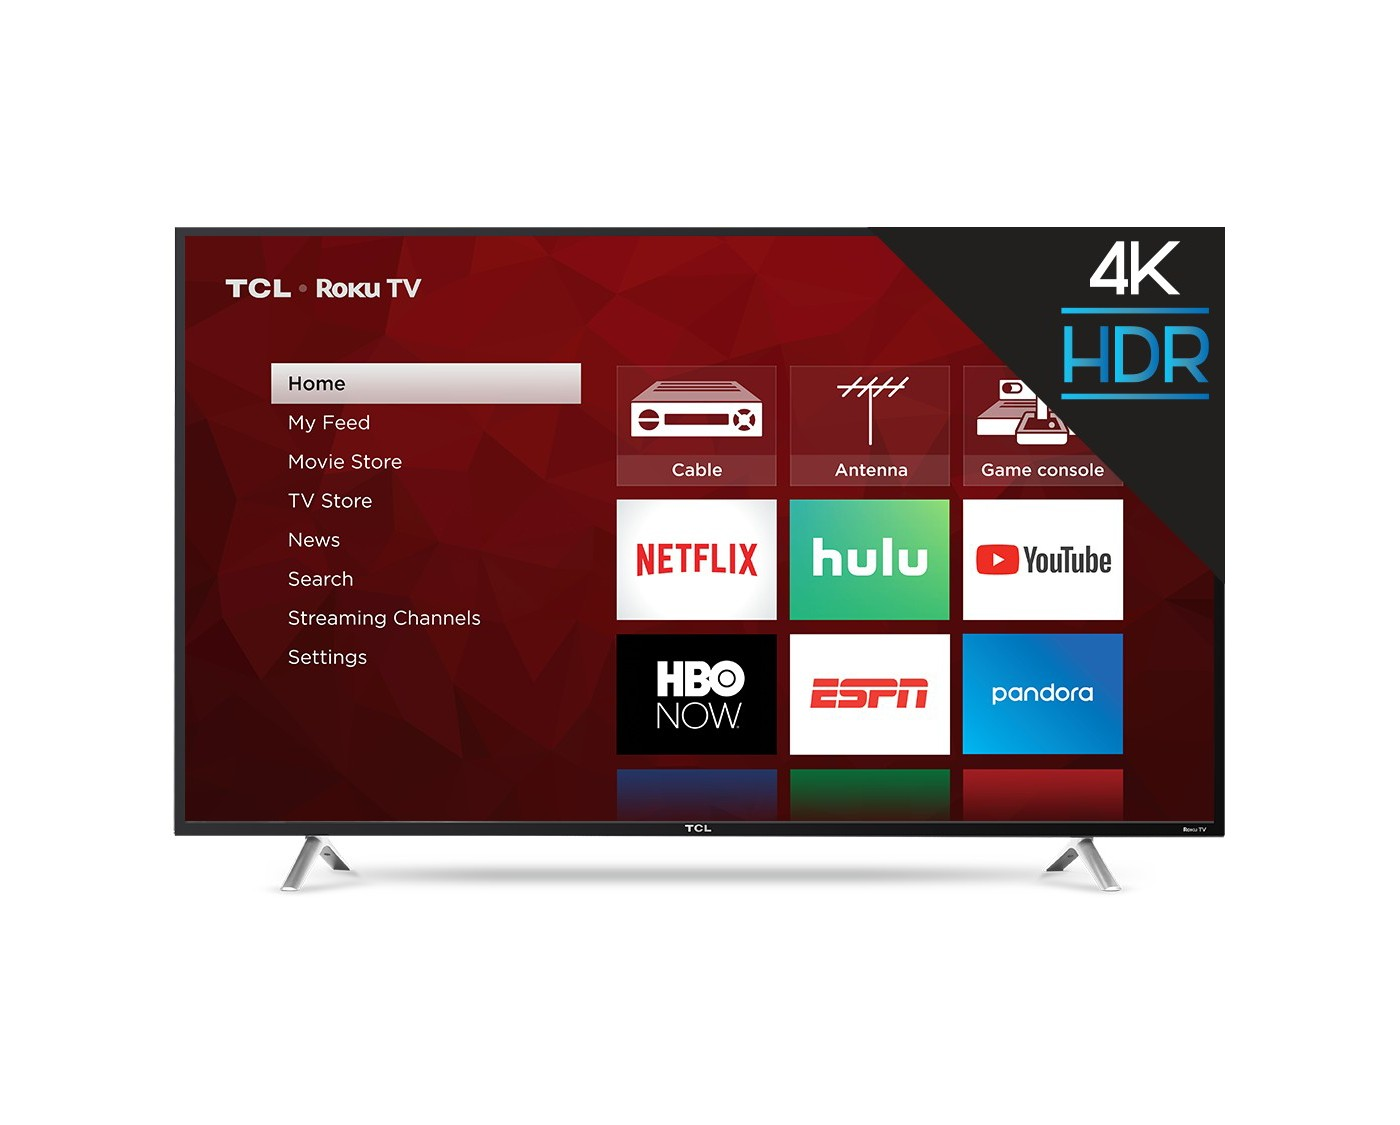 "TCL 55"" 4K HDR 120Hz CMI Roku Smart LED TV - Black (55S405) - image 1 of 14"